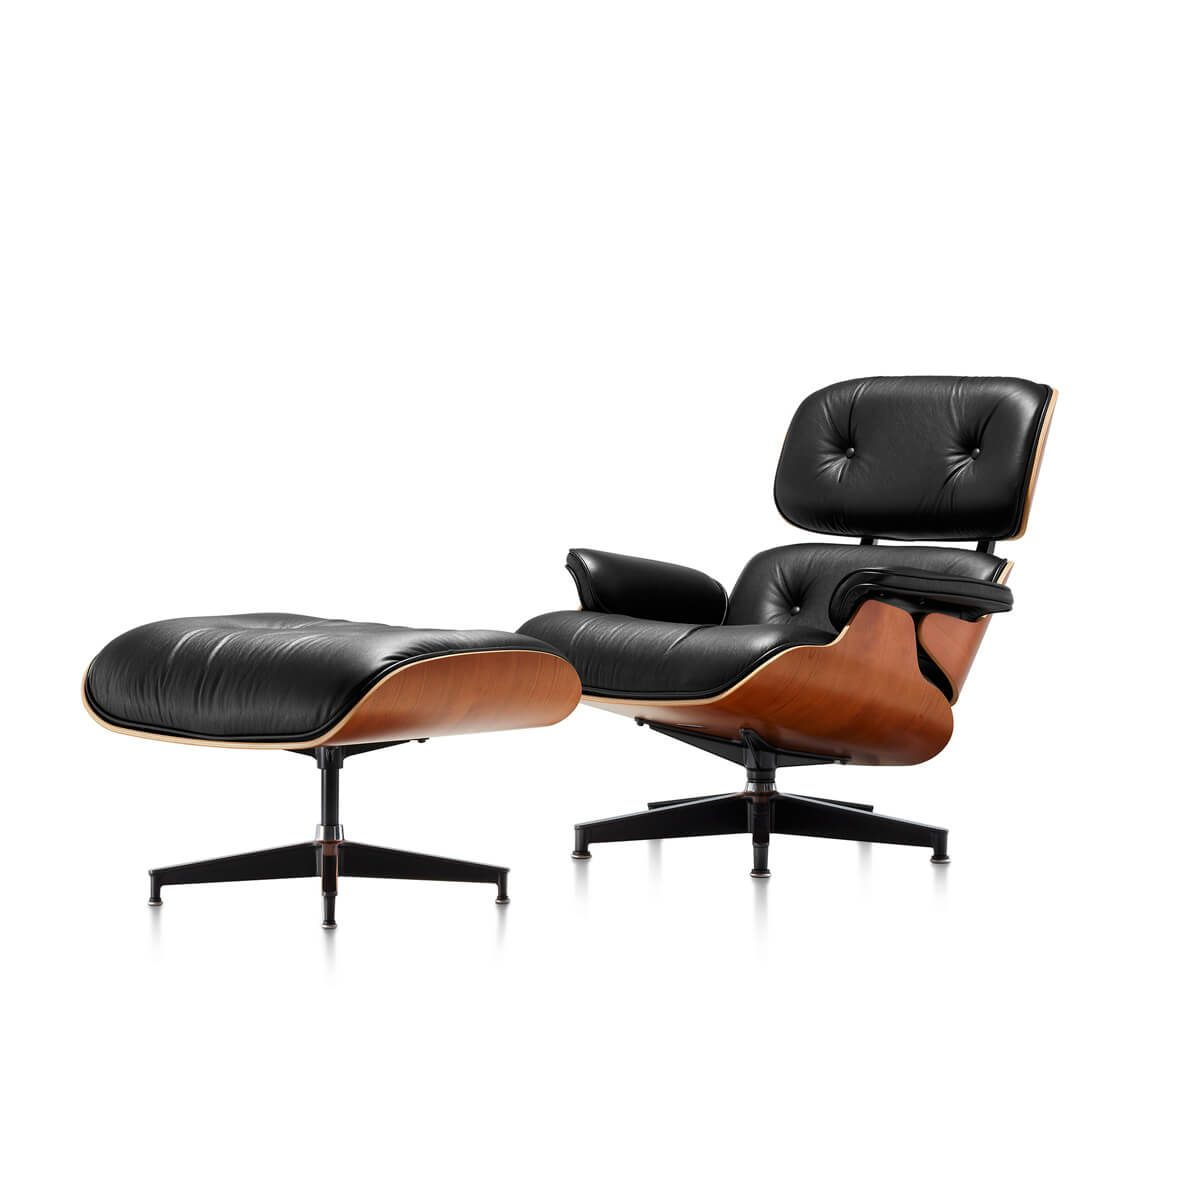 Eames Lounge Chair century modern